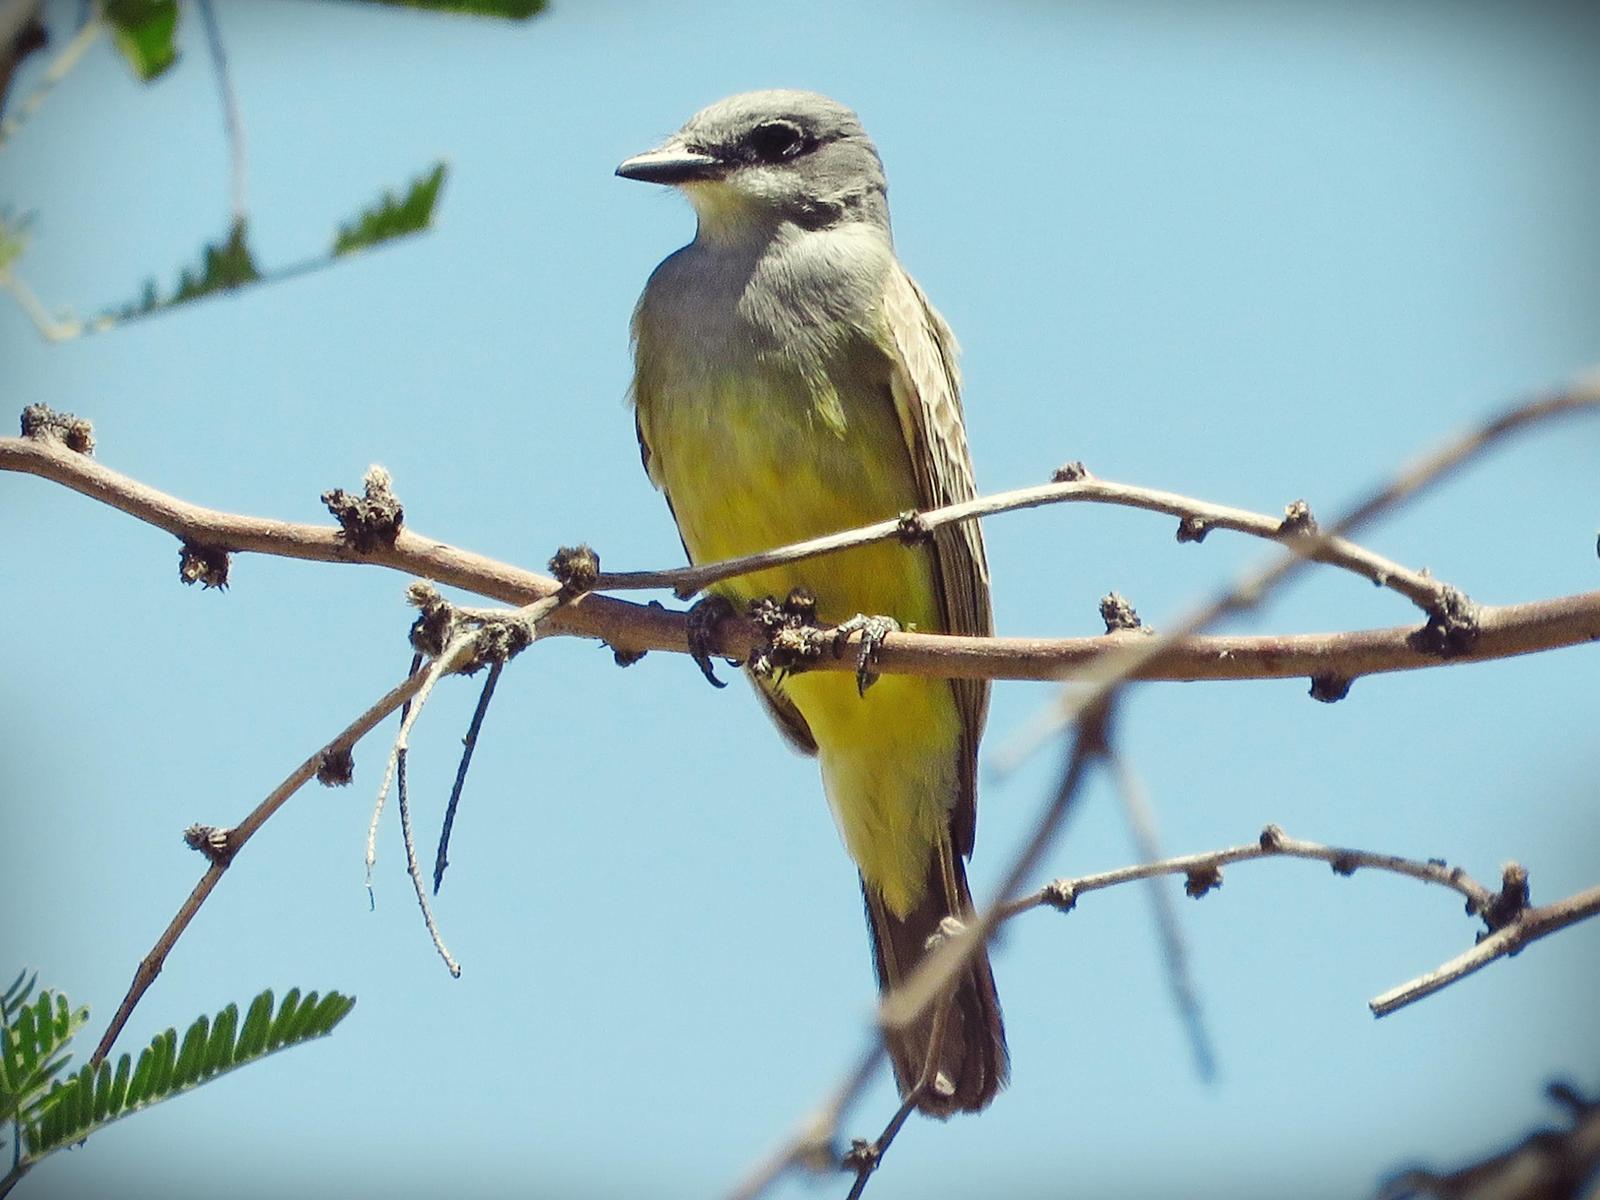 Cassin's Kingbird Photo by Bob Neugebauer